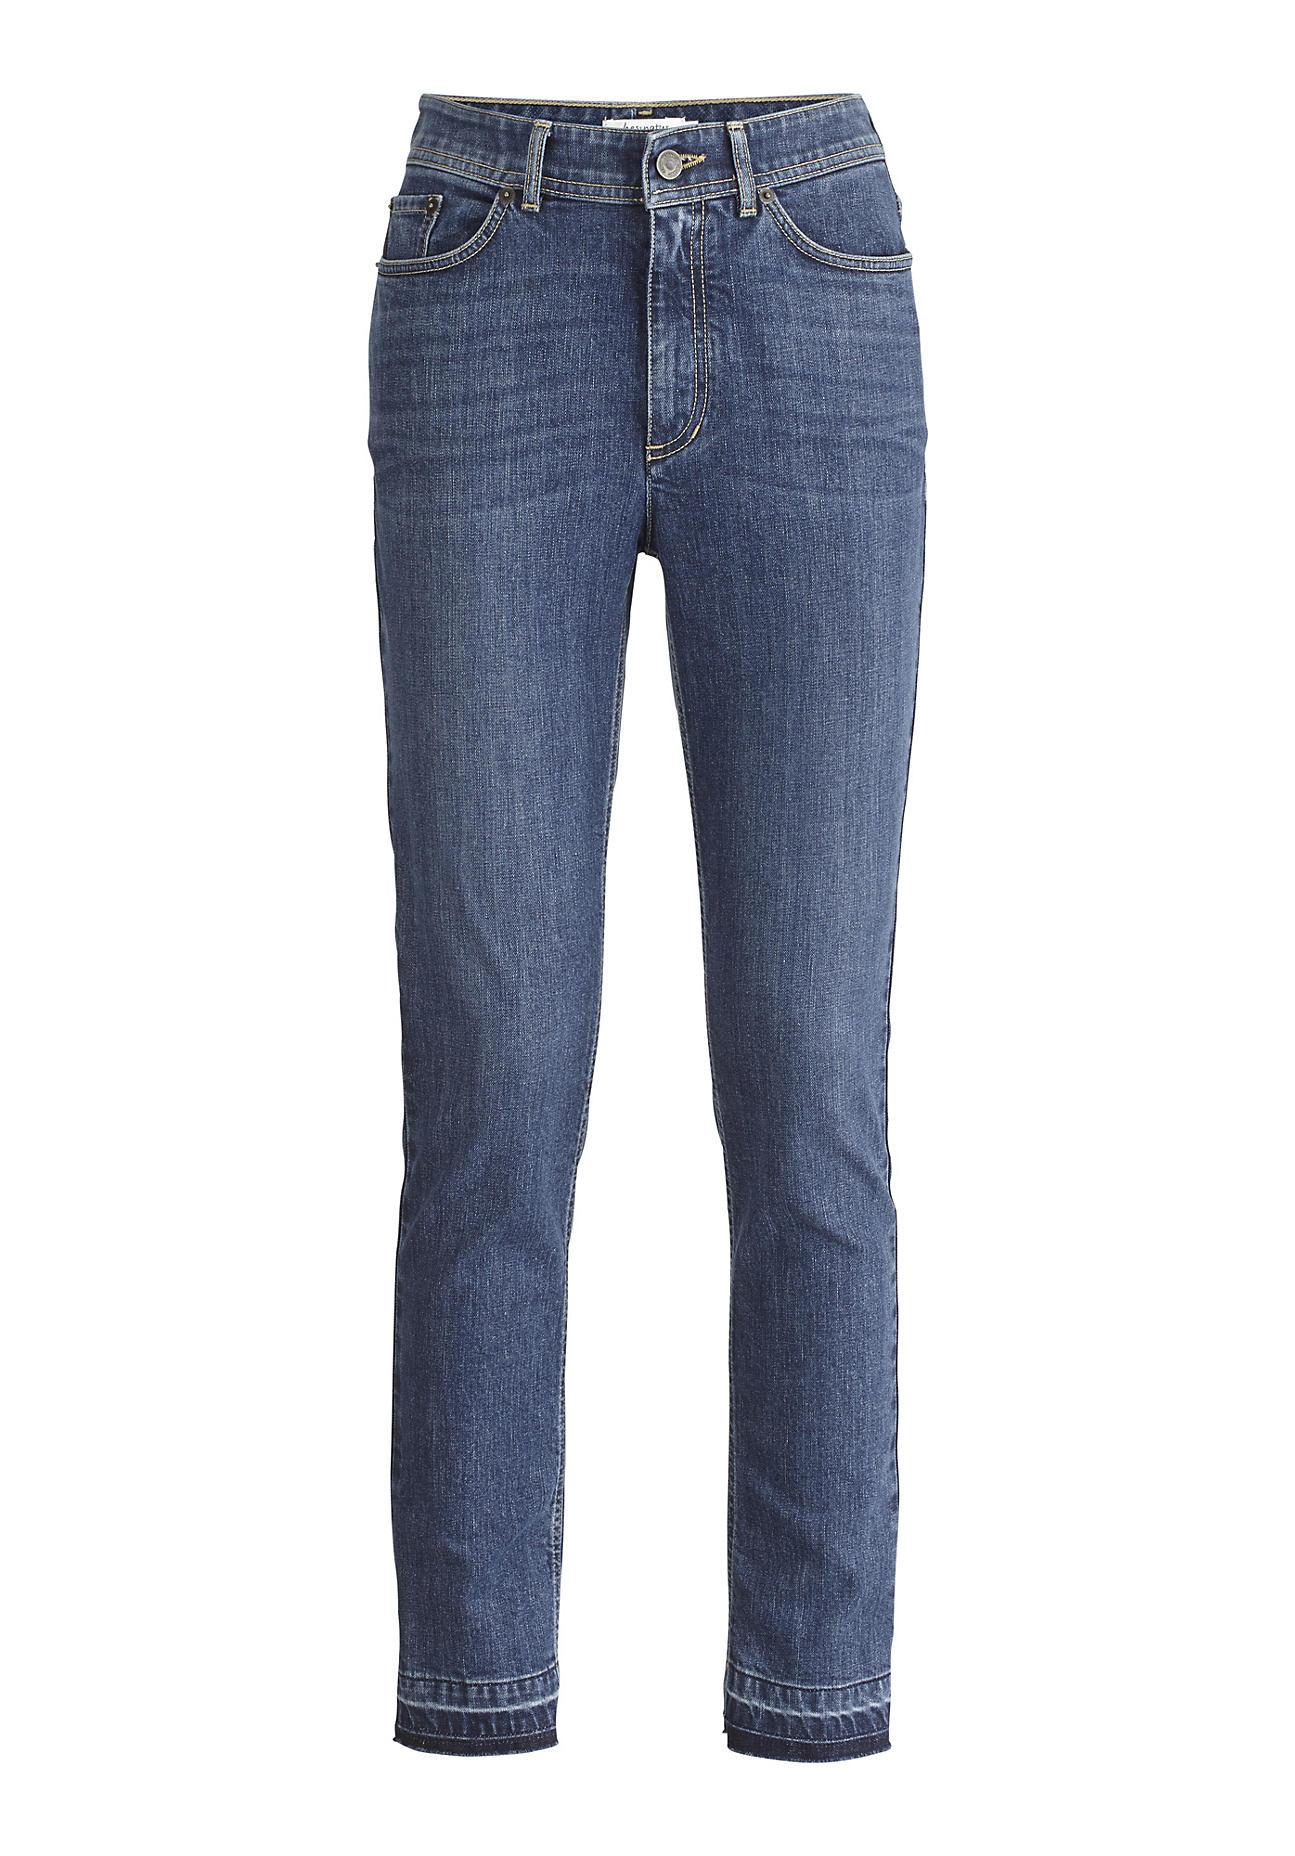 - https://imgs7.hessnatur.com/is/image/HessNatur/generalfeed_large/Jeans_Slim_Fit_Mid_Waist_aus_Bio_Denim-48719_03_7.jpg